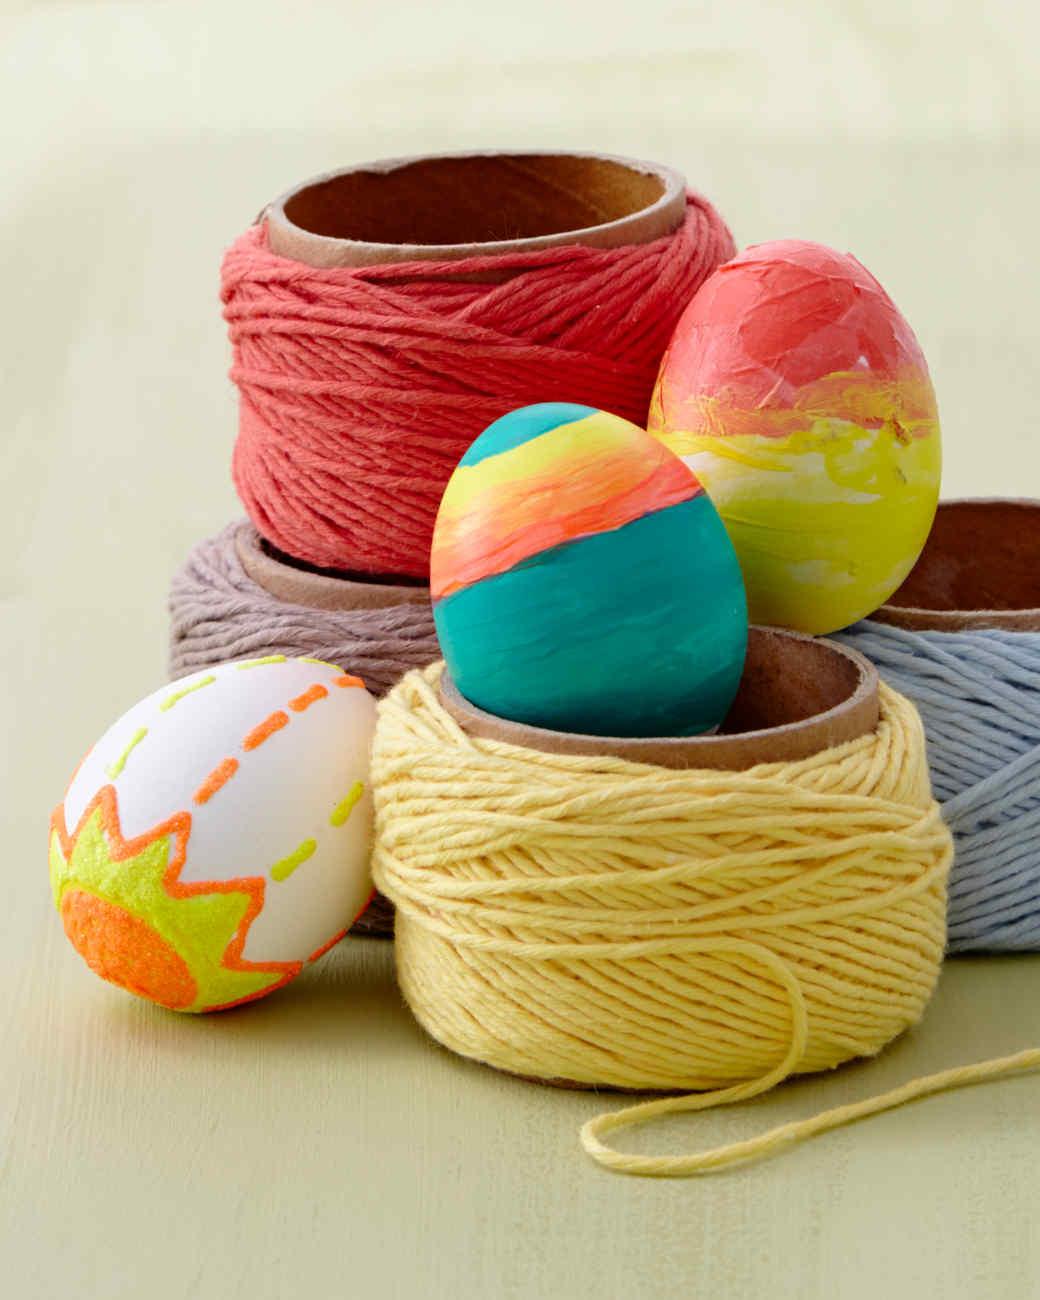 yarn-color-block-egg-0023.jpg